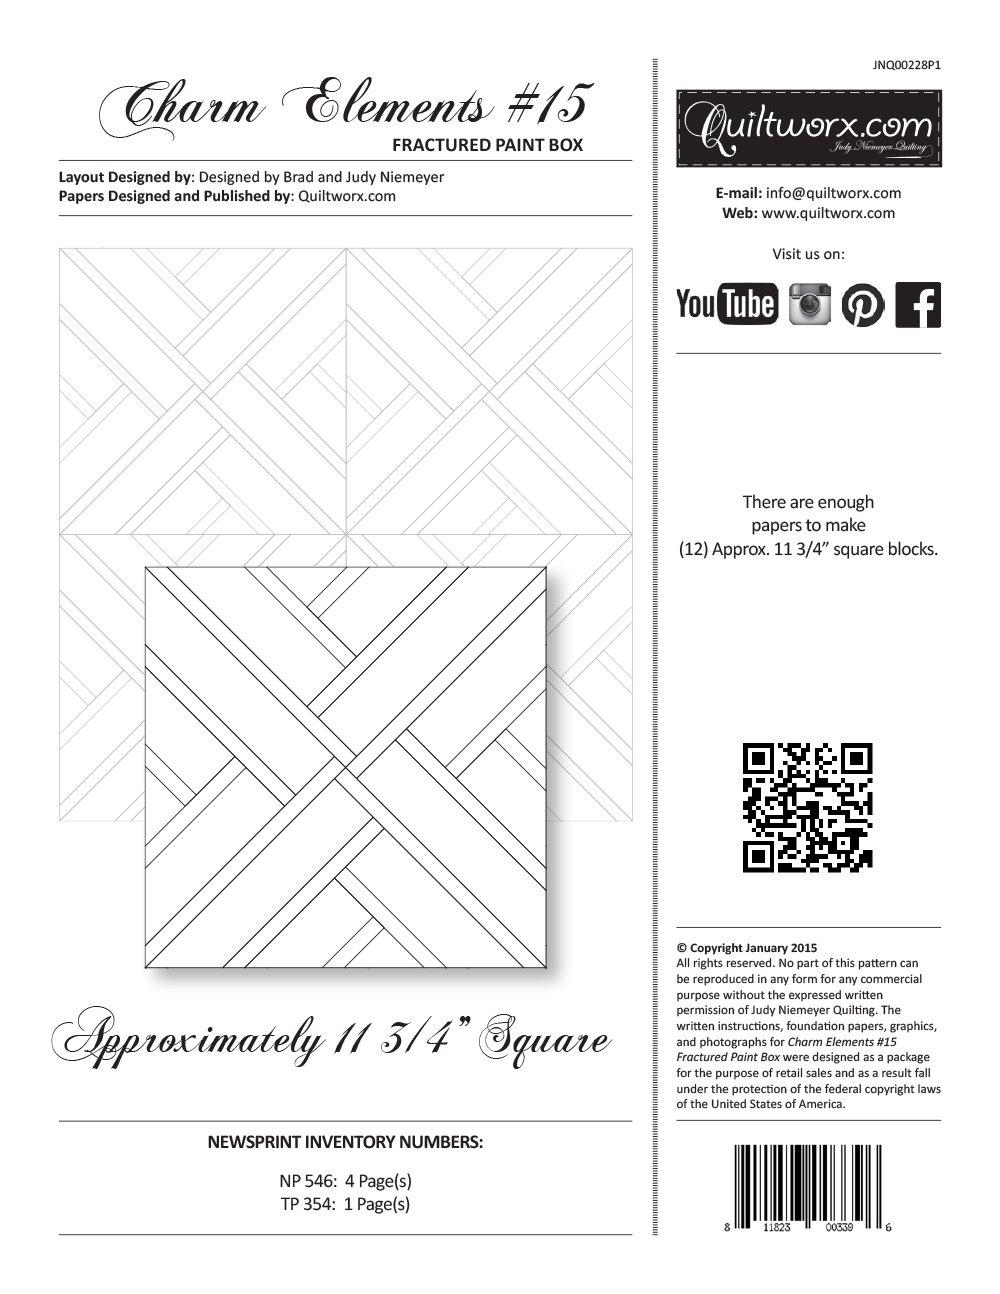 Charm Elements #15 - Fractured Paint Box